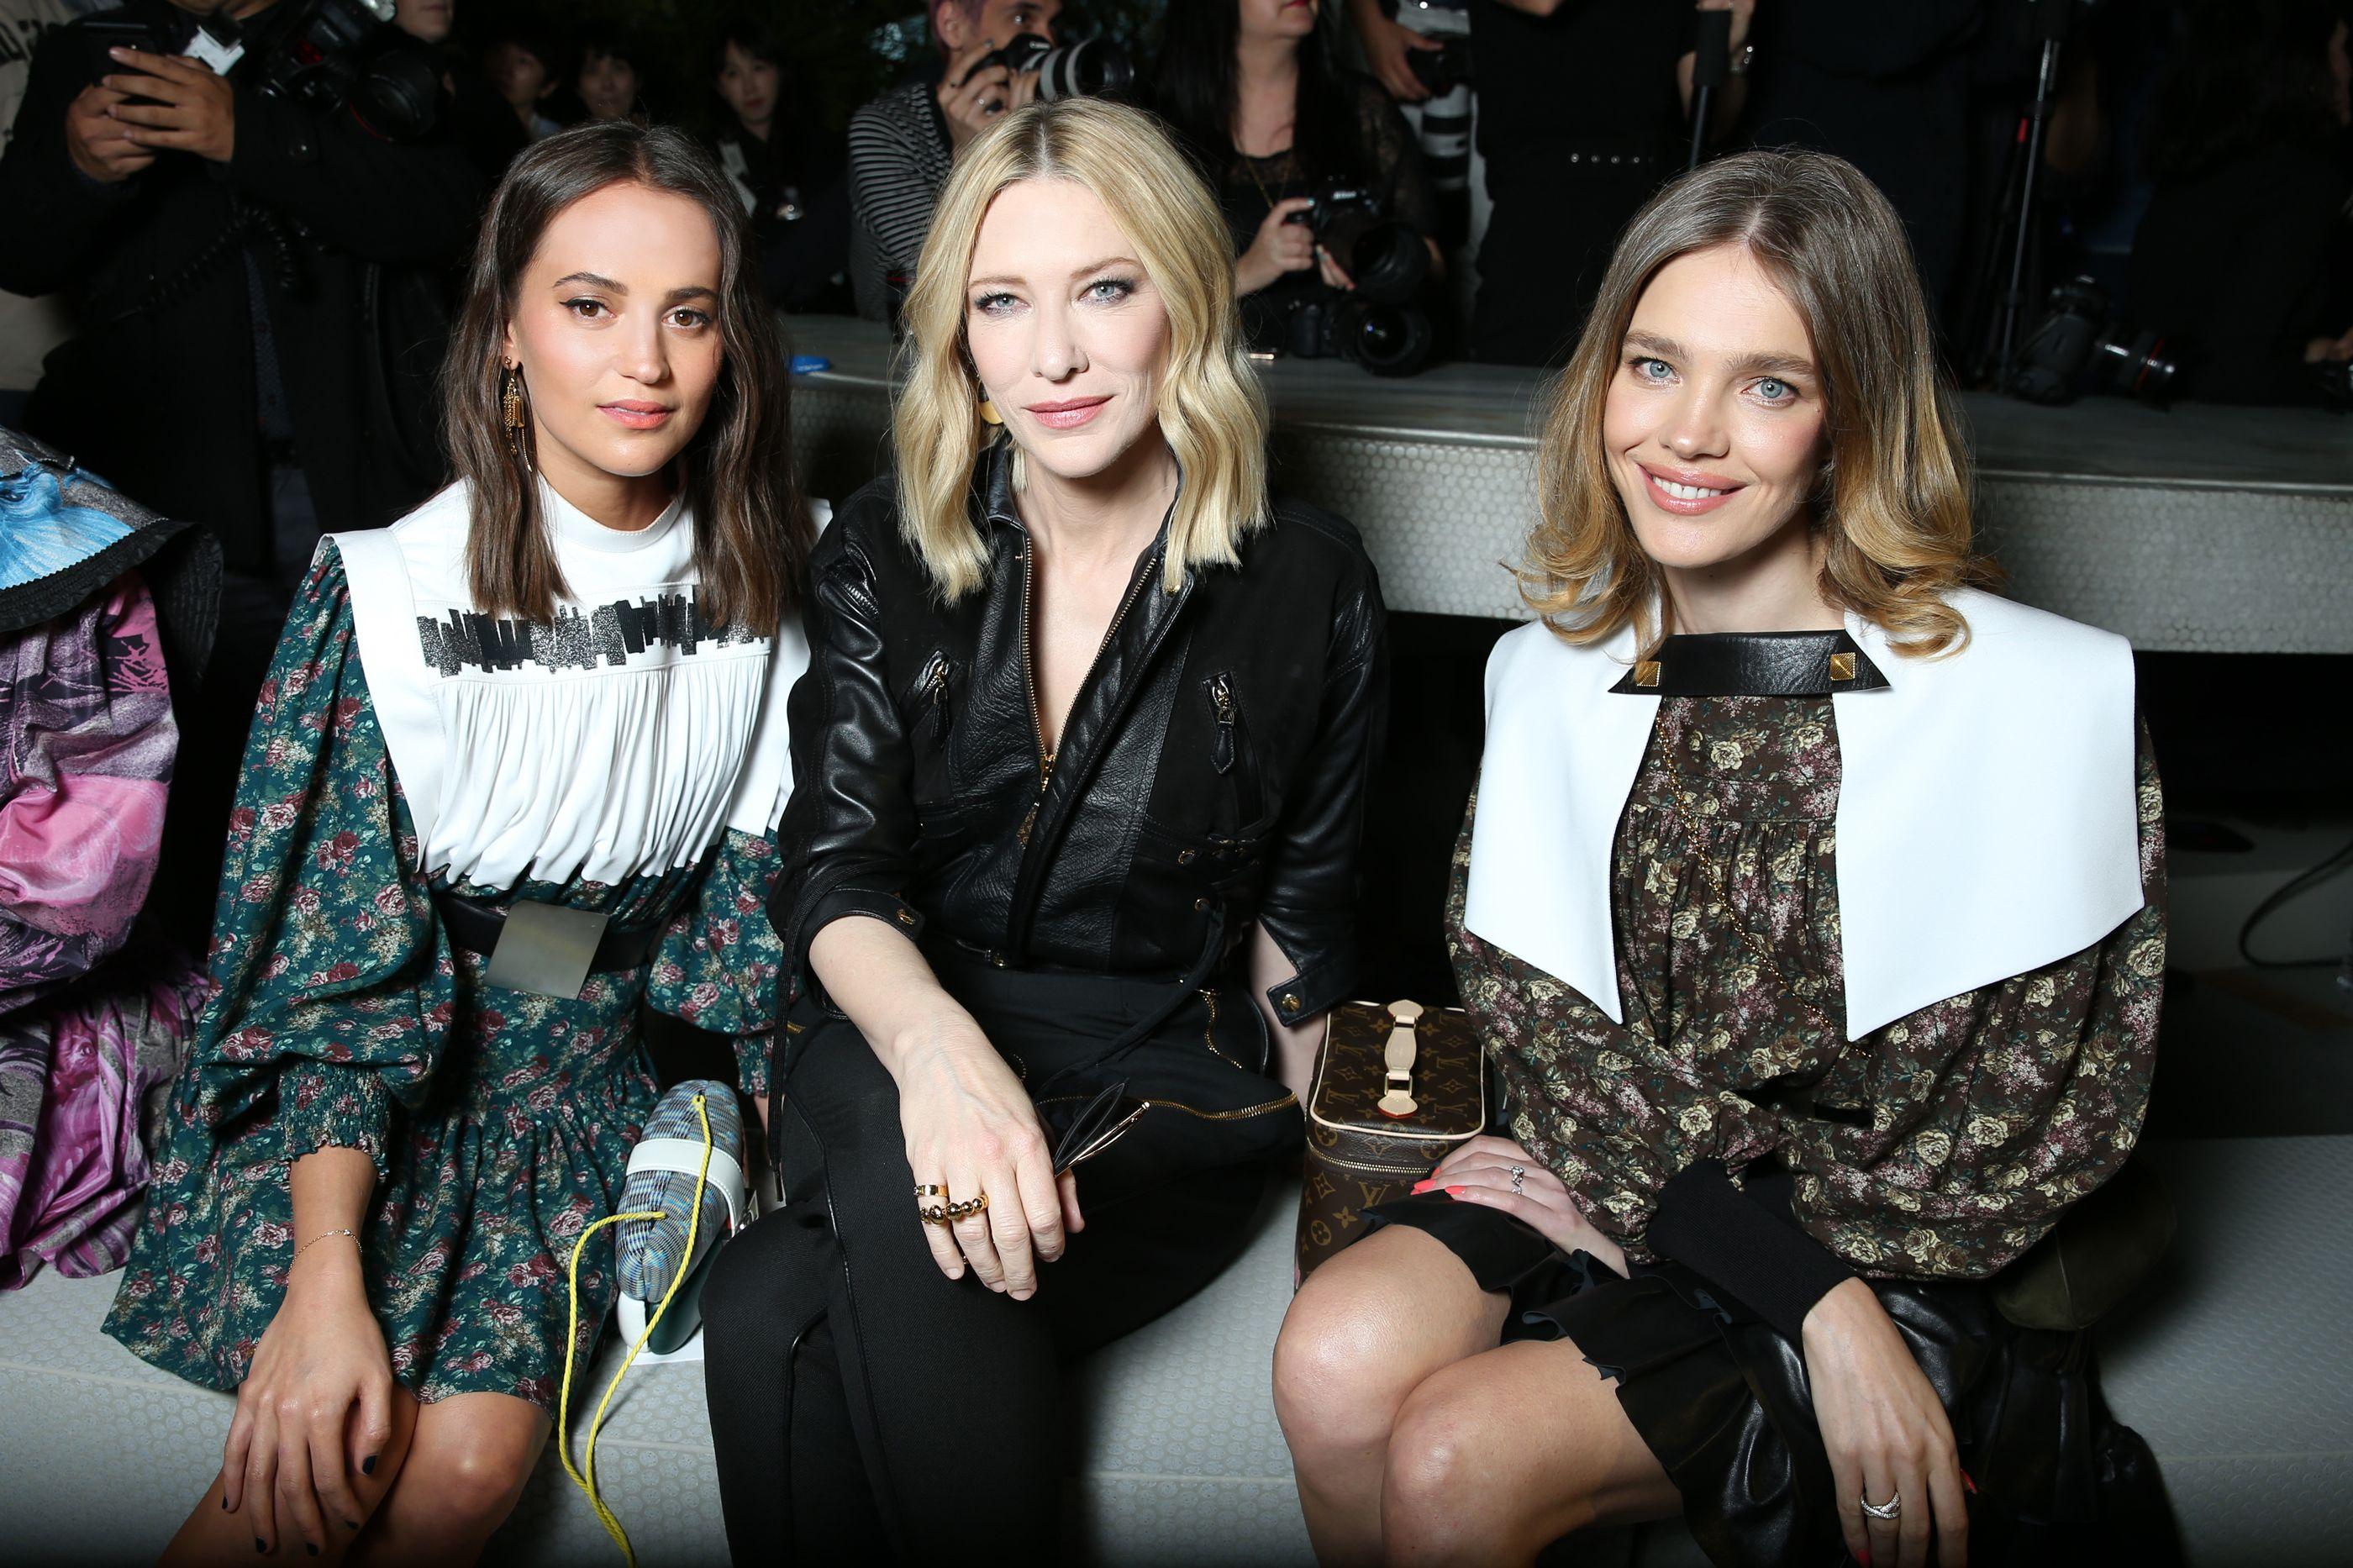 Alicia Vikander, Cate Blanchett, and Natalia Vodianova in the front row.